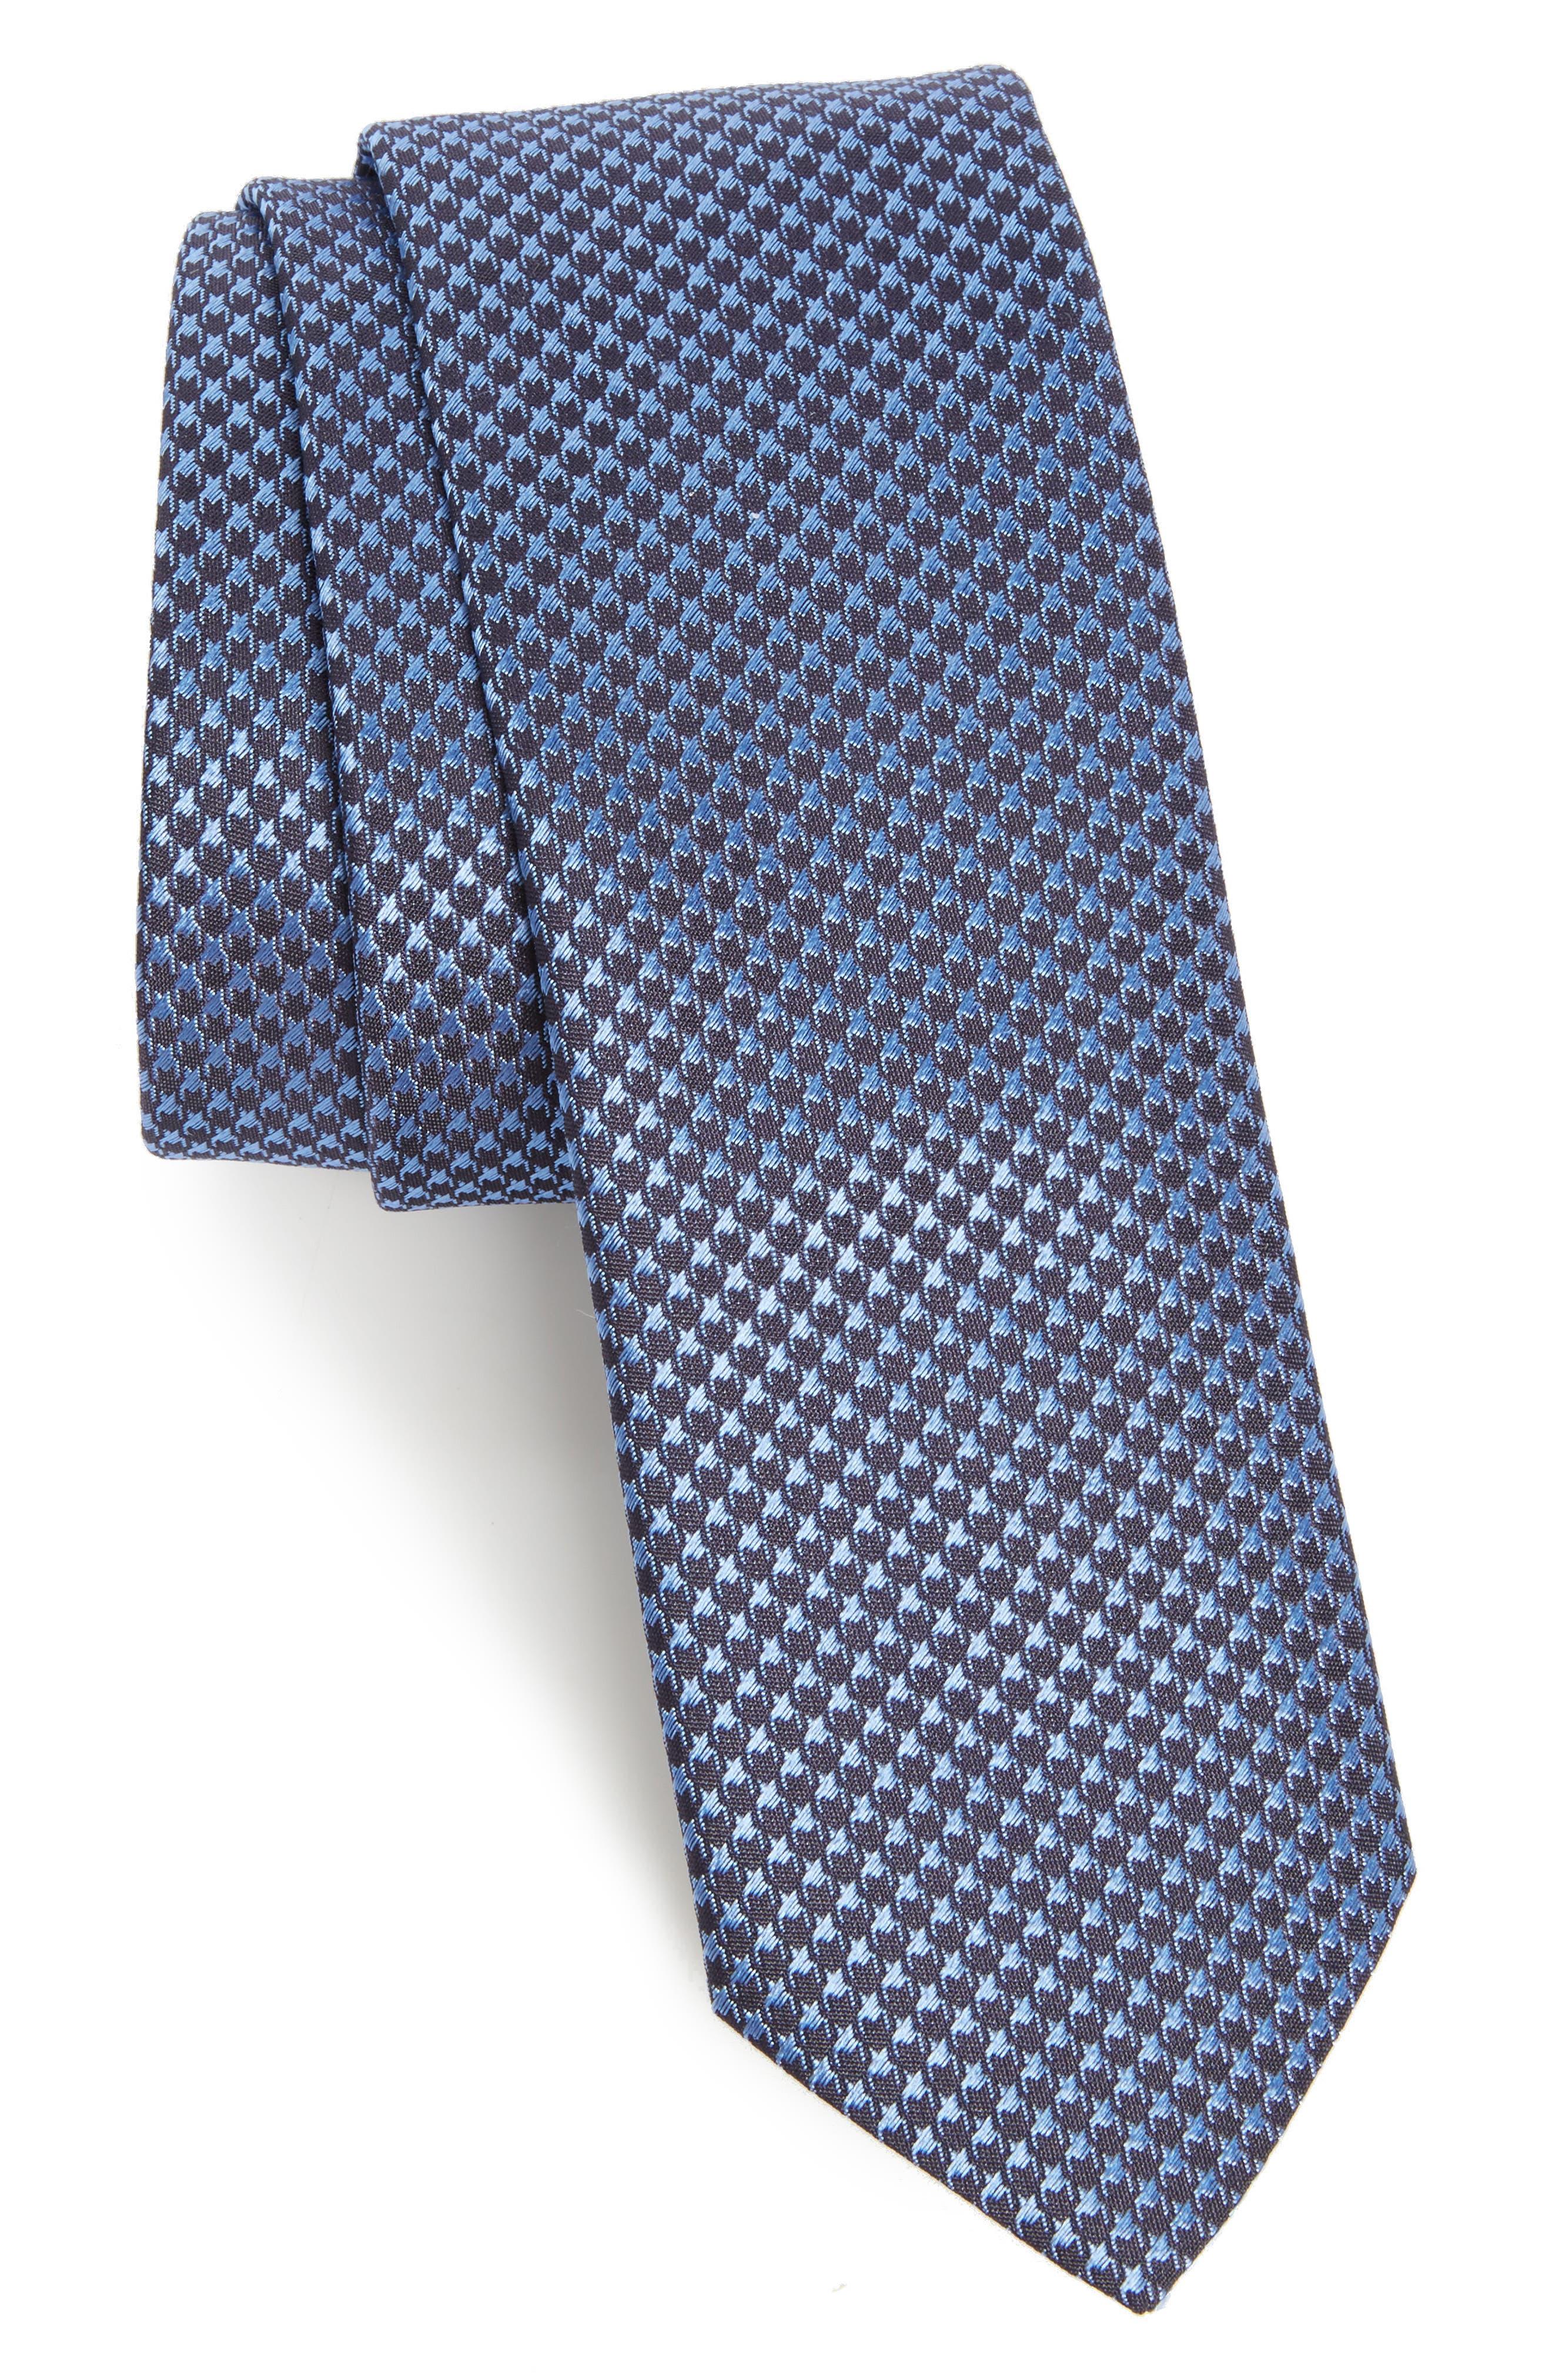 BOSS Houndstooth Silk Tie